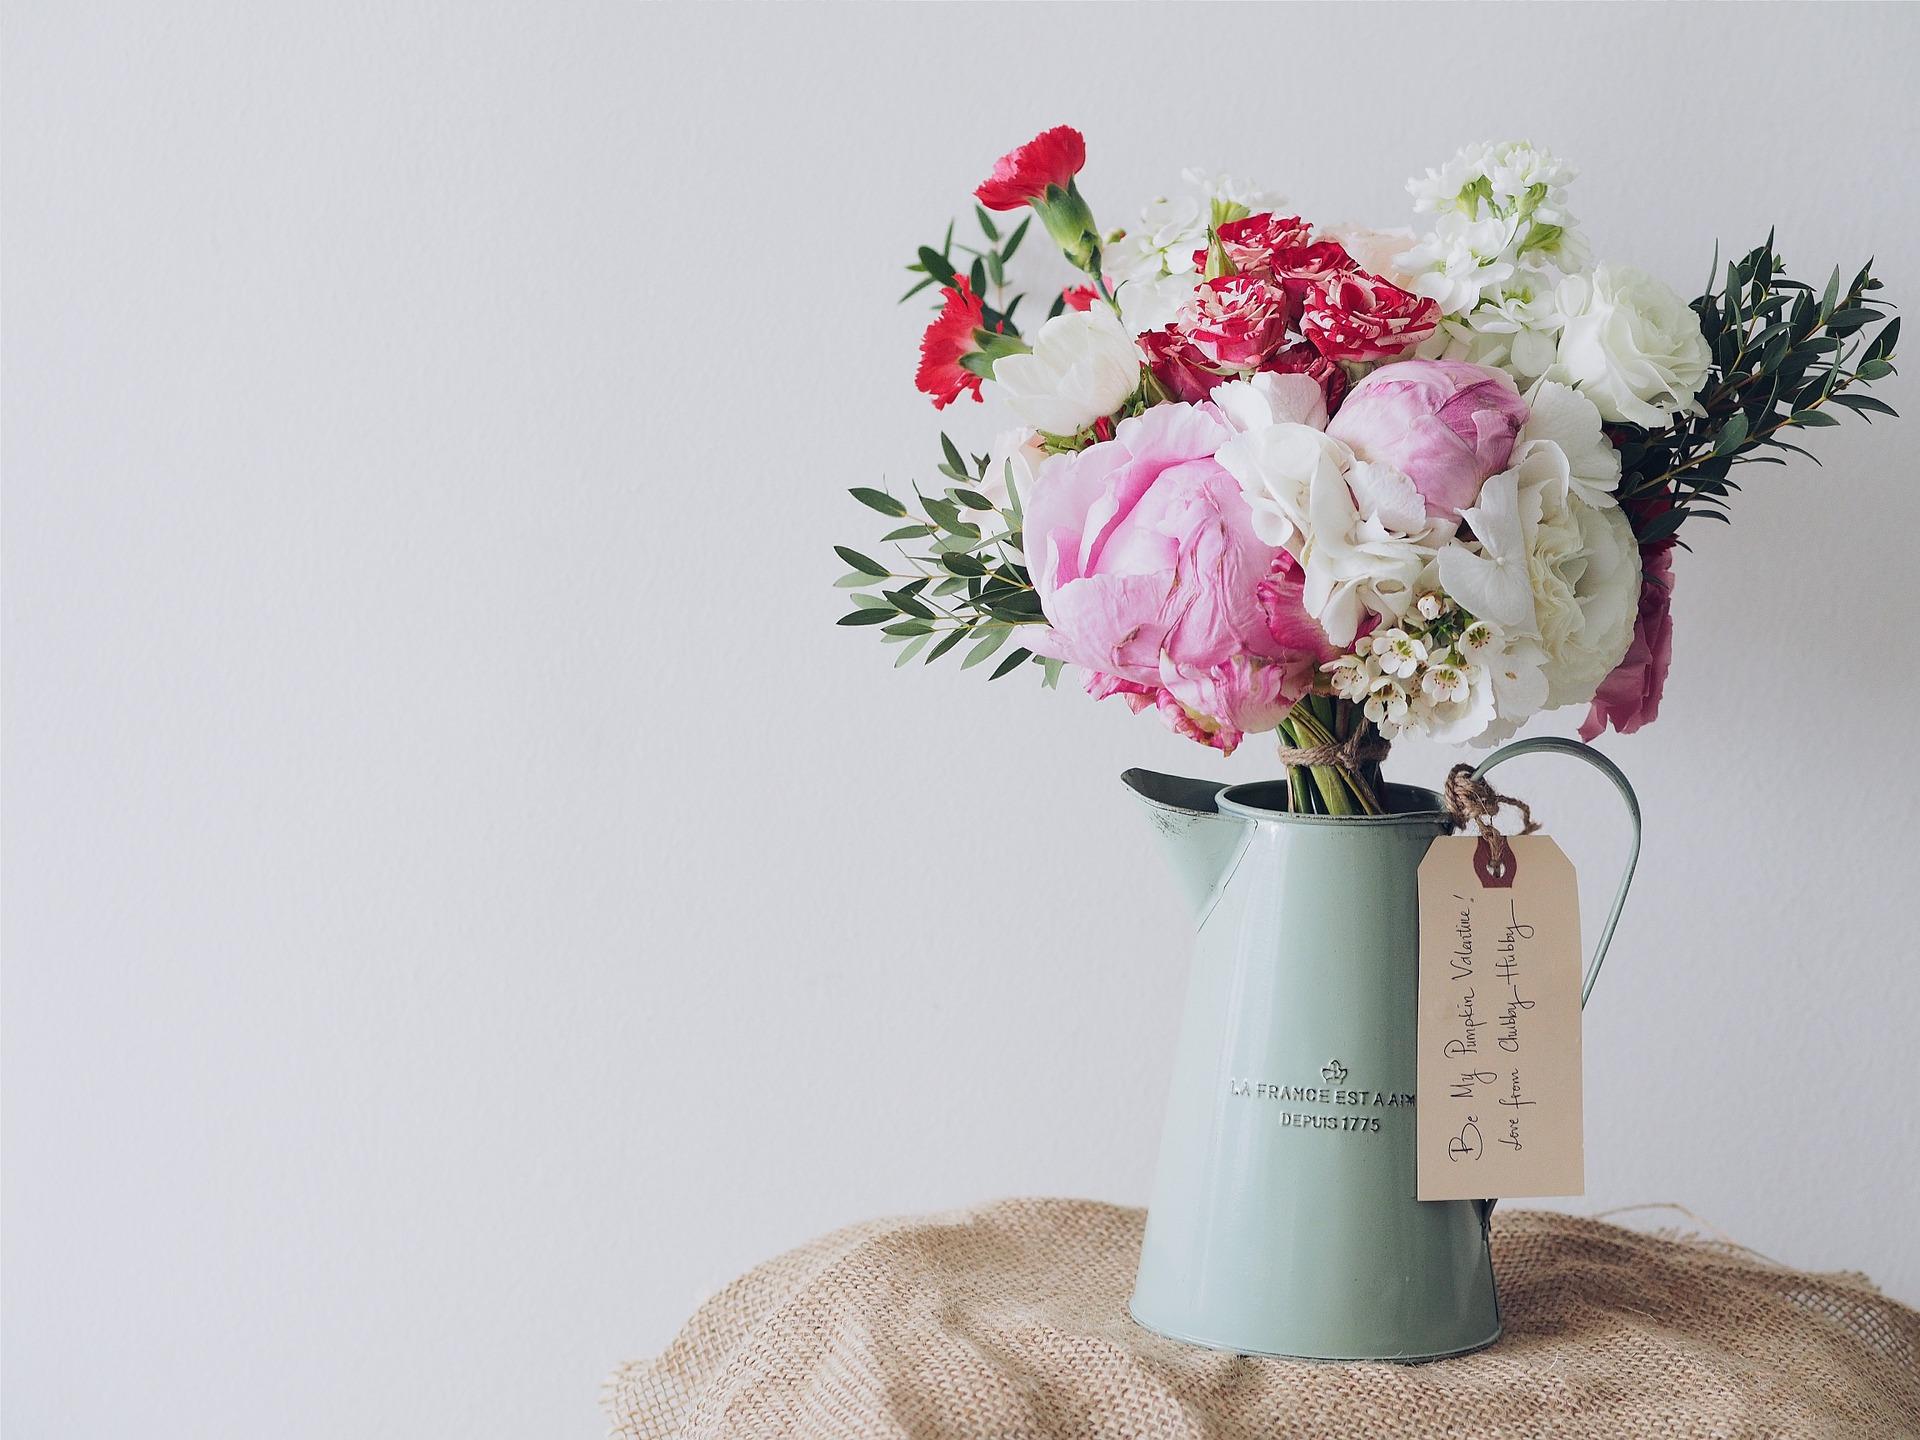 How to make flower arrangements that last